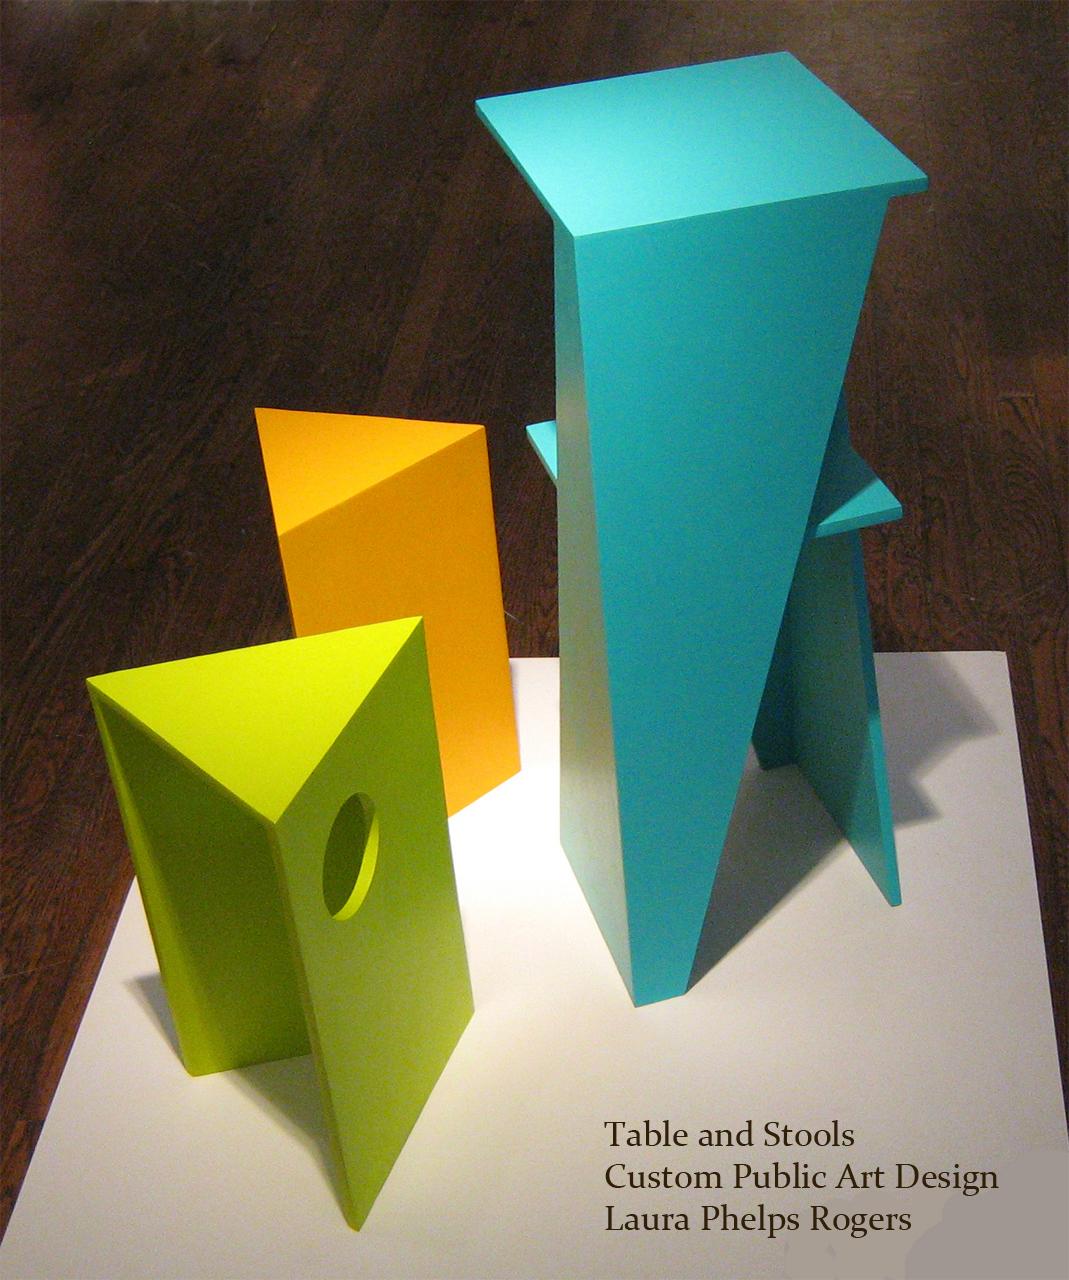 Custom Table and Stools _ laura phelps rogers.jpg